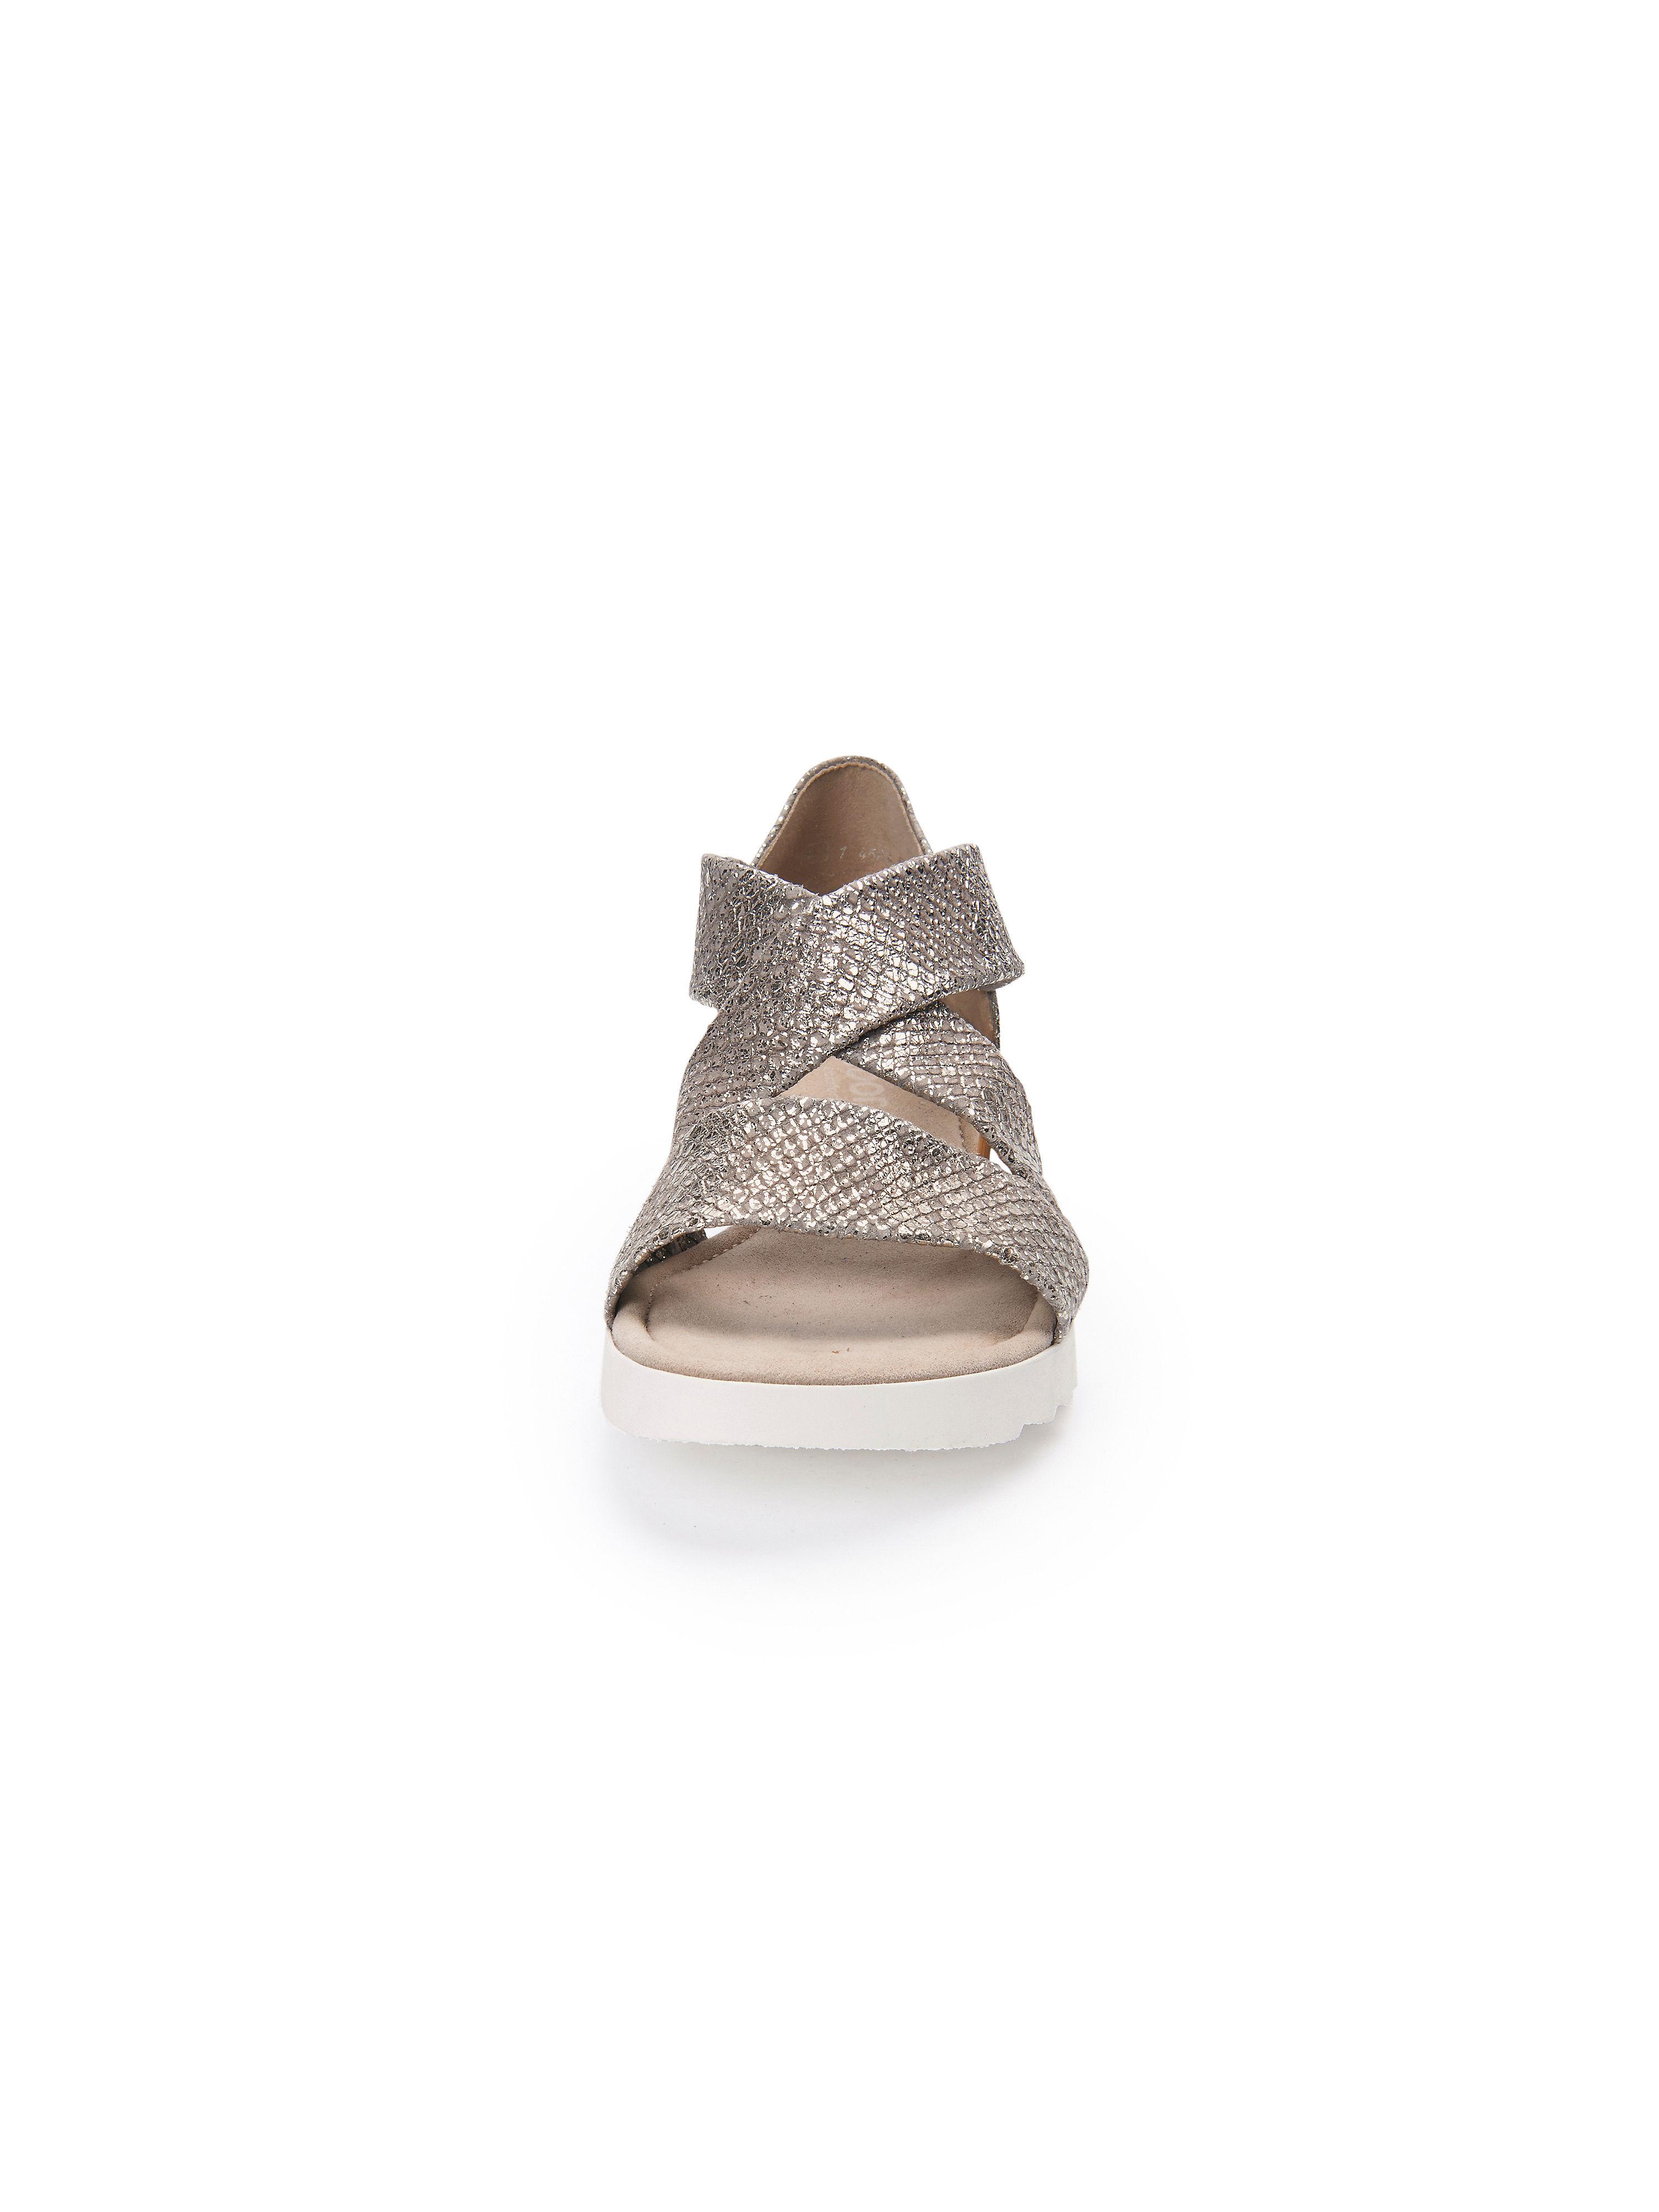 Gabor - Sandale aus Gute 100% Leder - Taupe-Metallic Gute aus Qualität beliebte Schuhe d93e01